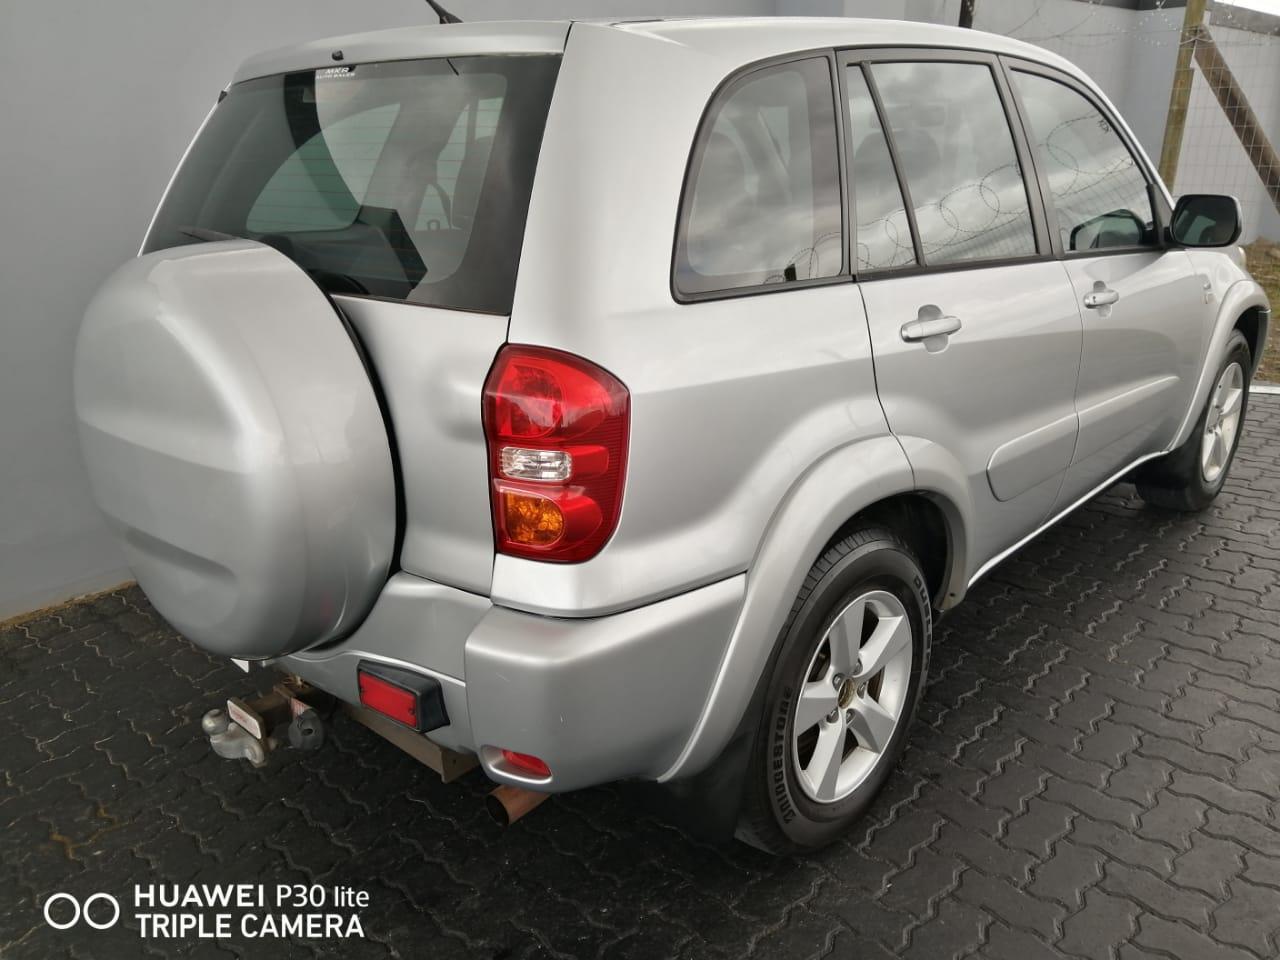 2005 Toyota Rav4 RAV4 180 5 door